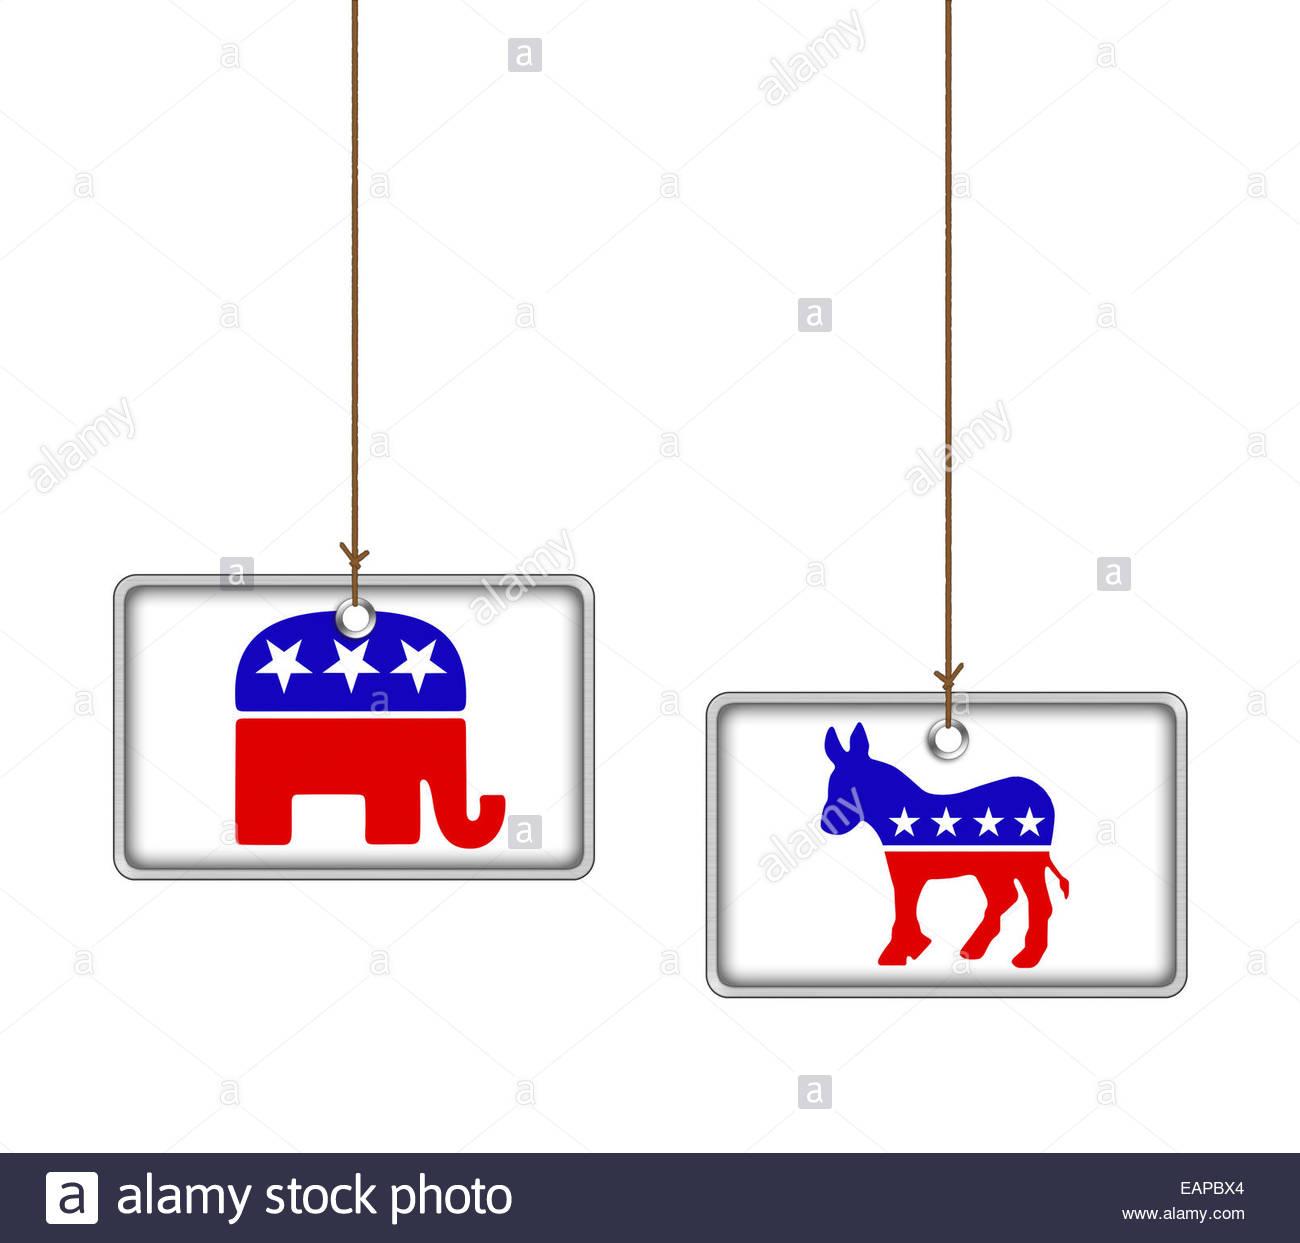 Democrats and Republican icon logo - Stock Image